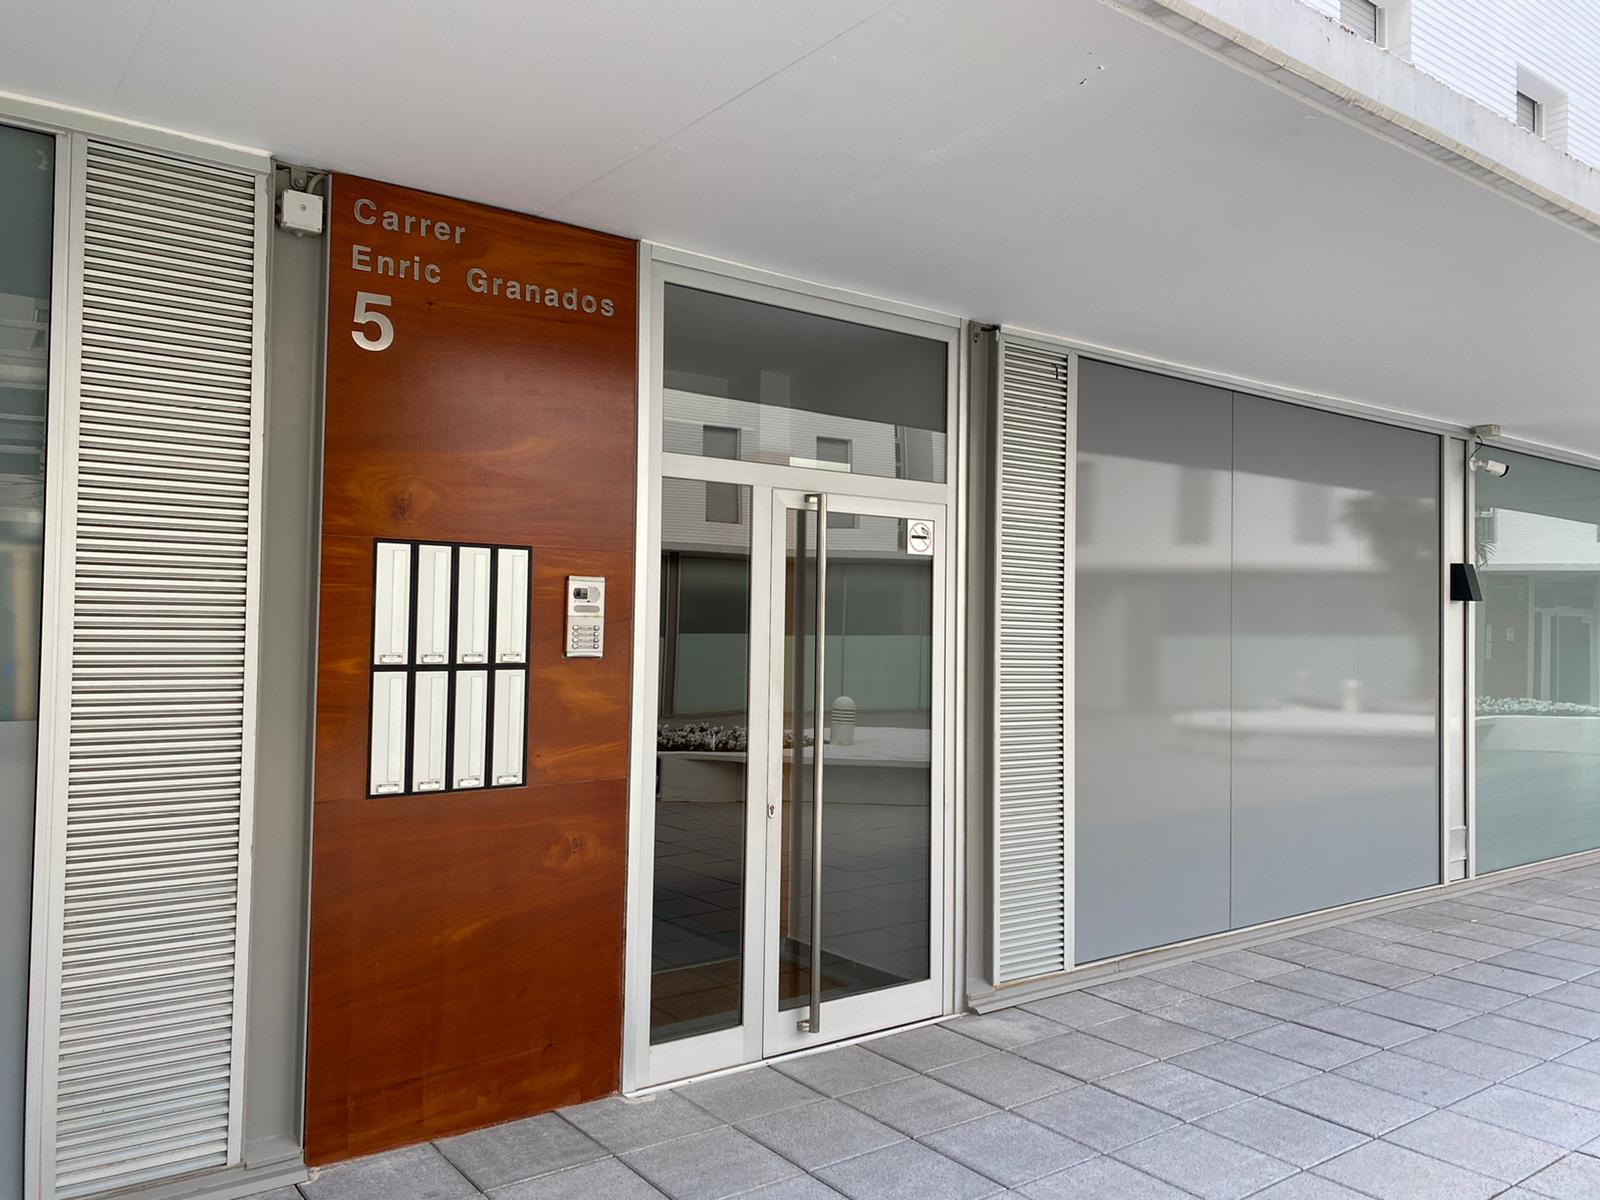 Puerta de la escalera del apartamento